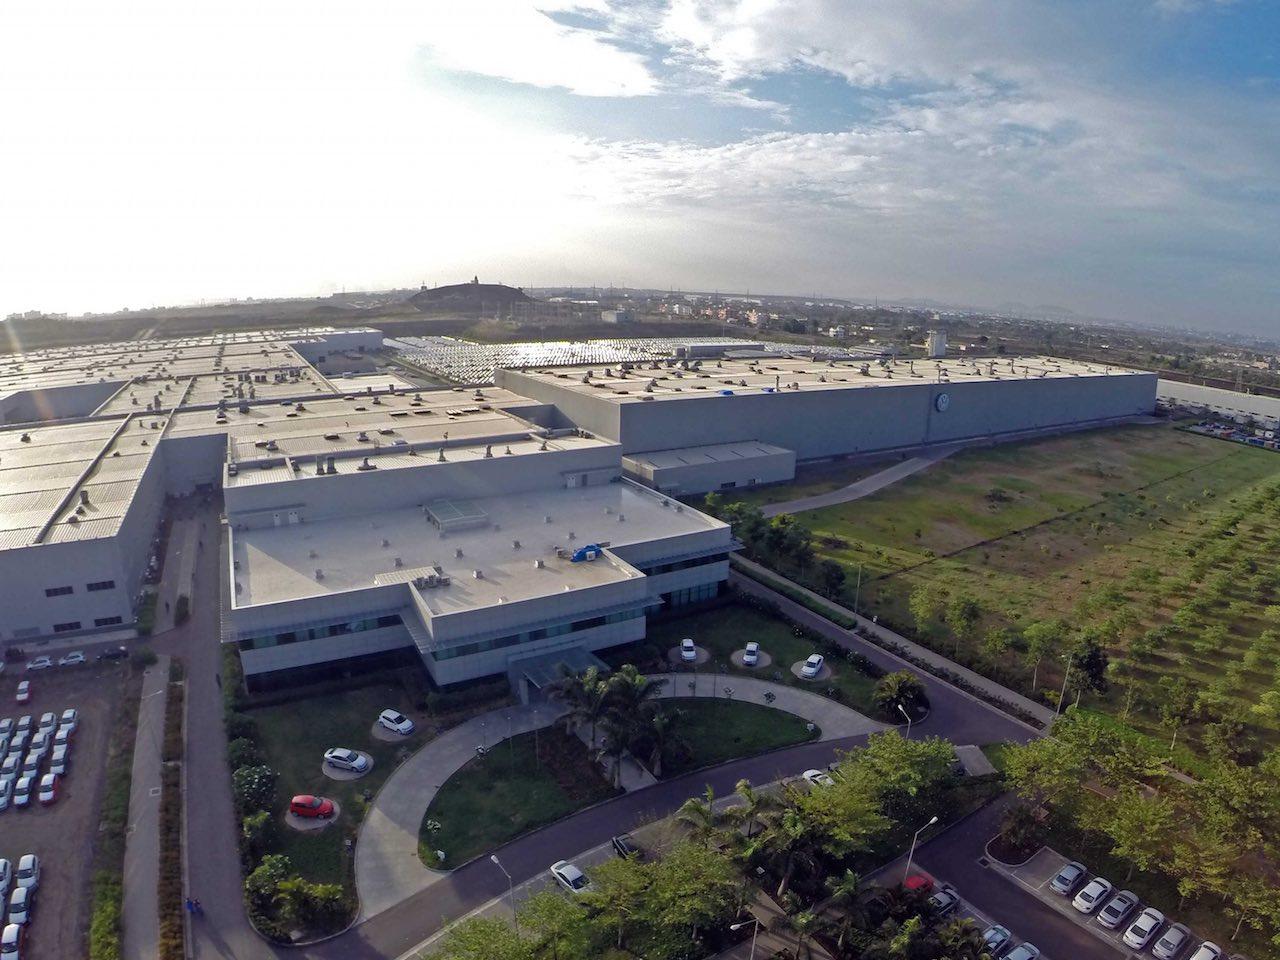 Volkswagen car plant in Pune, India